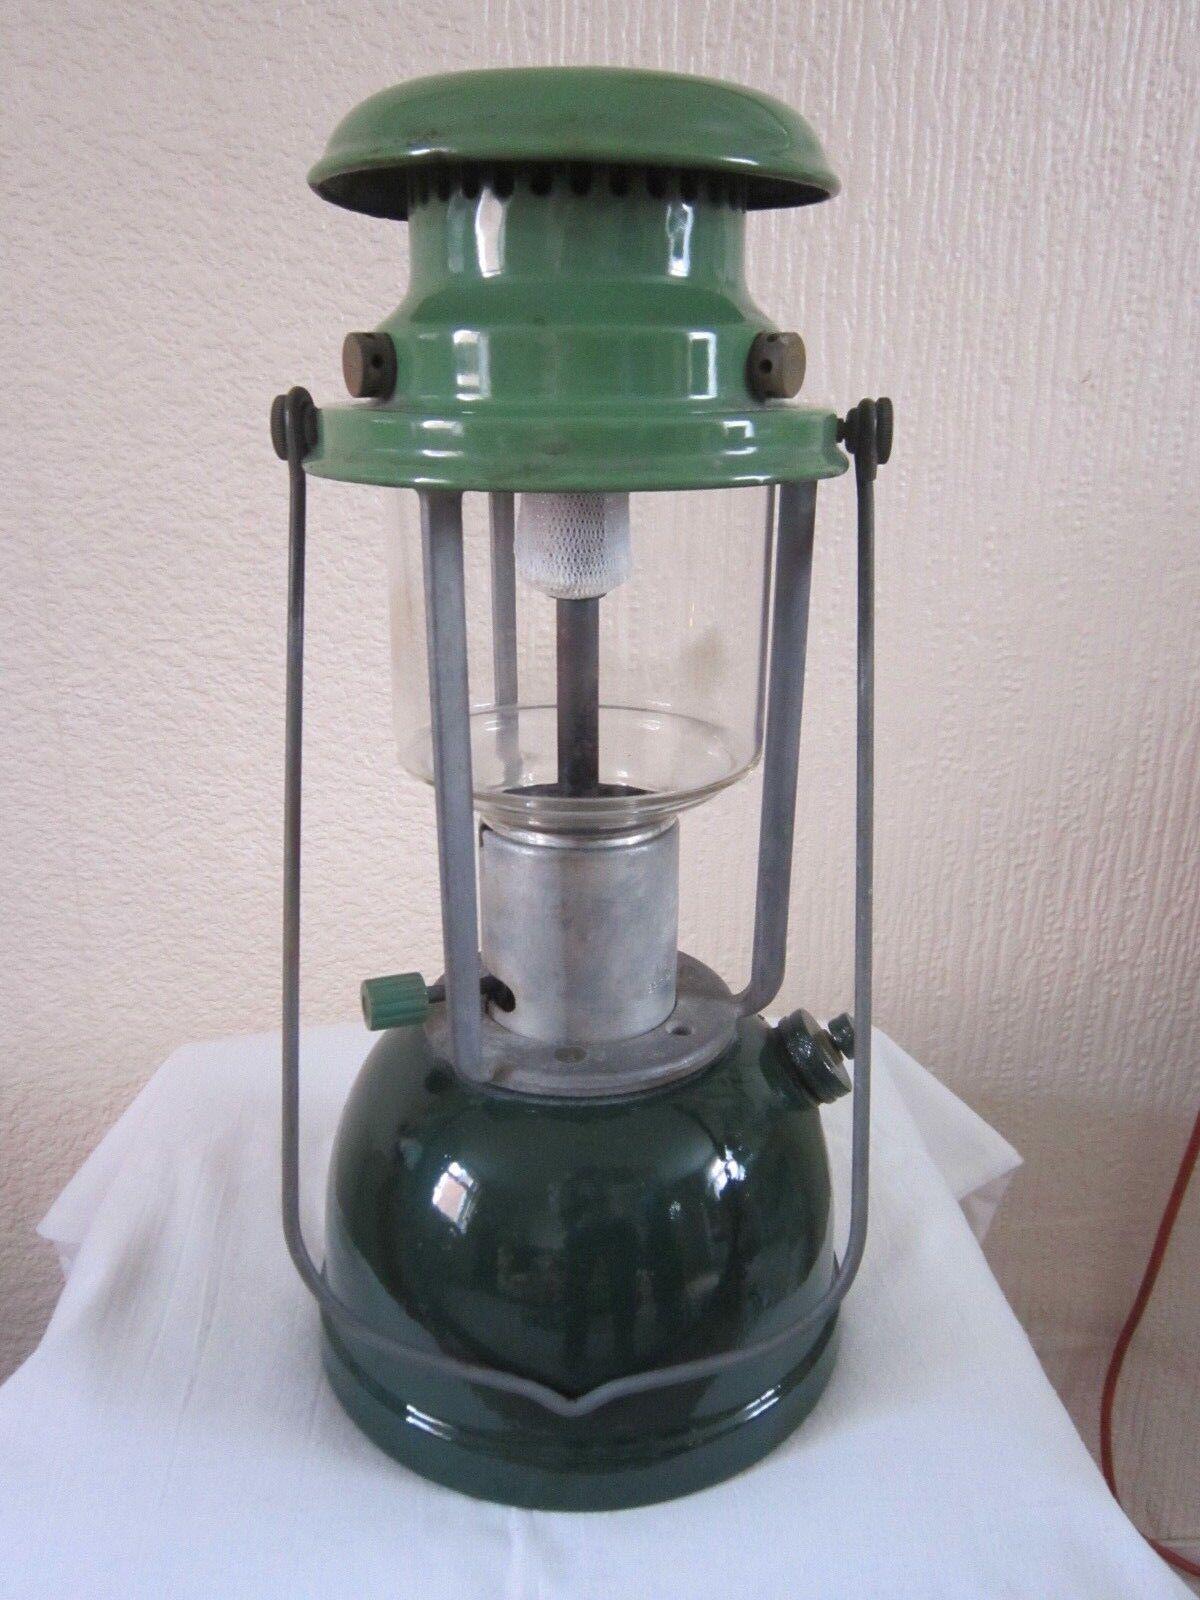 VAPALUX BIALADDIN MODEL 310 PARAFFIN OIL LAMP THE RARE LANTERN.